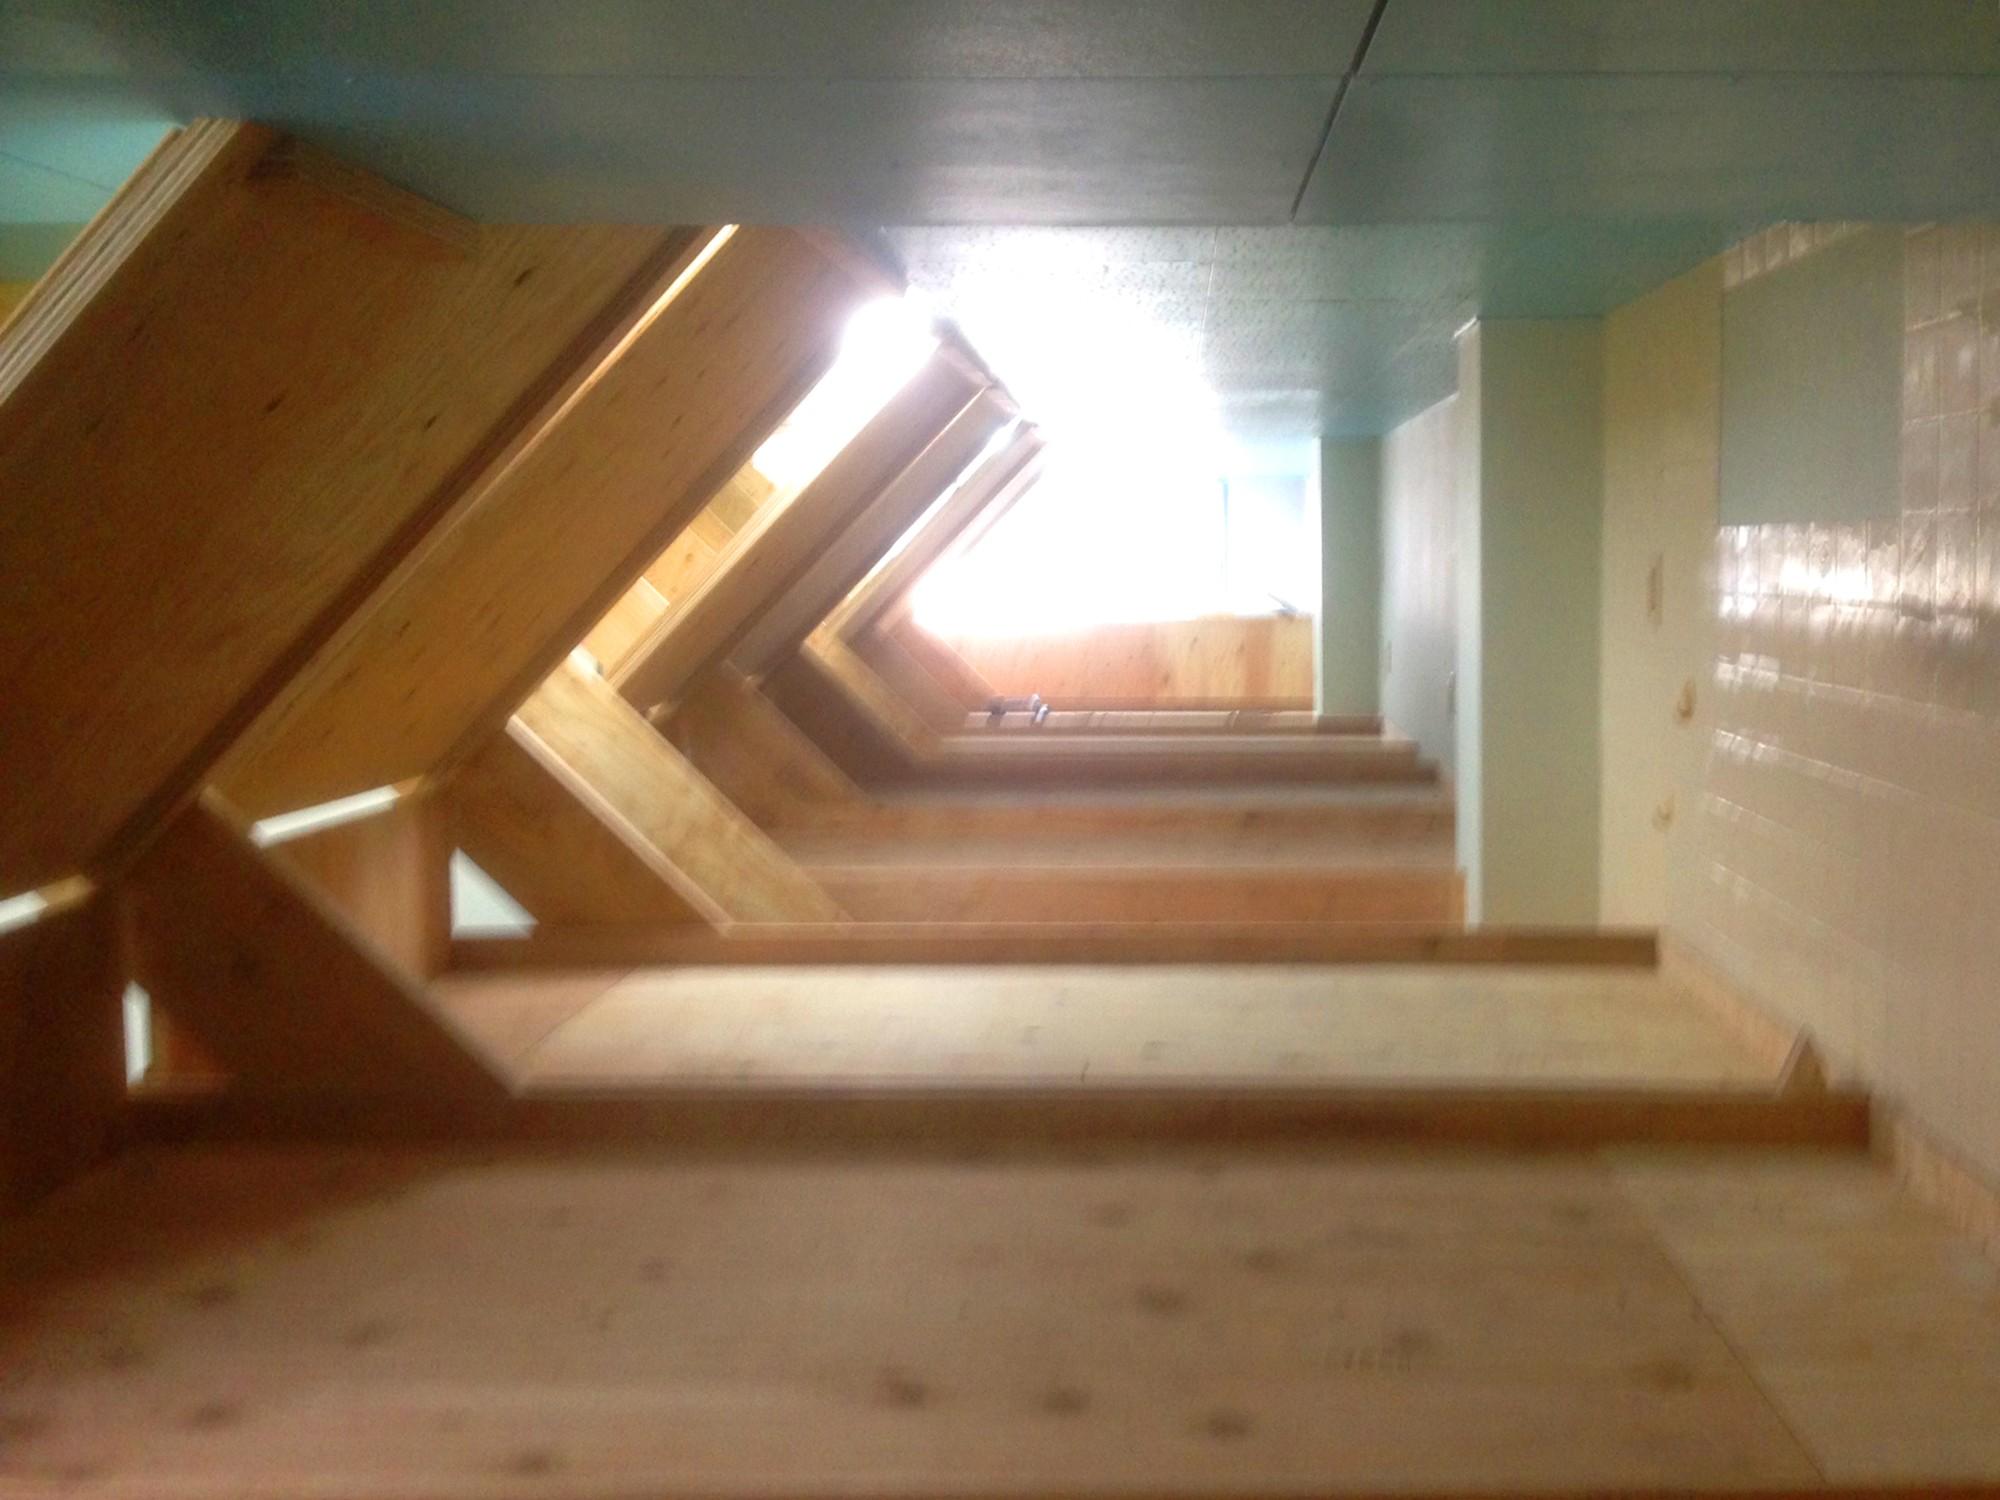 Music Uni Street Backpackers Hostel (2階のベッドにのぼると端から端まで歩いていける)